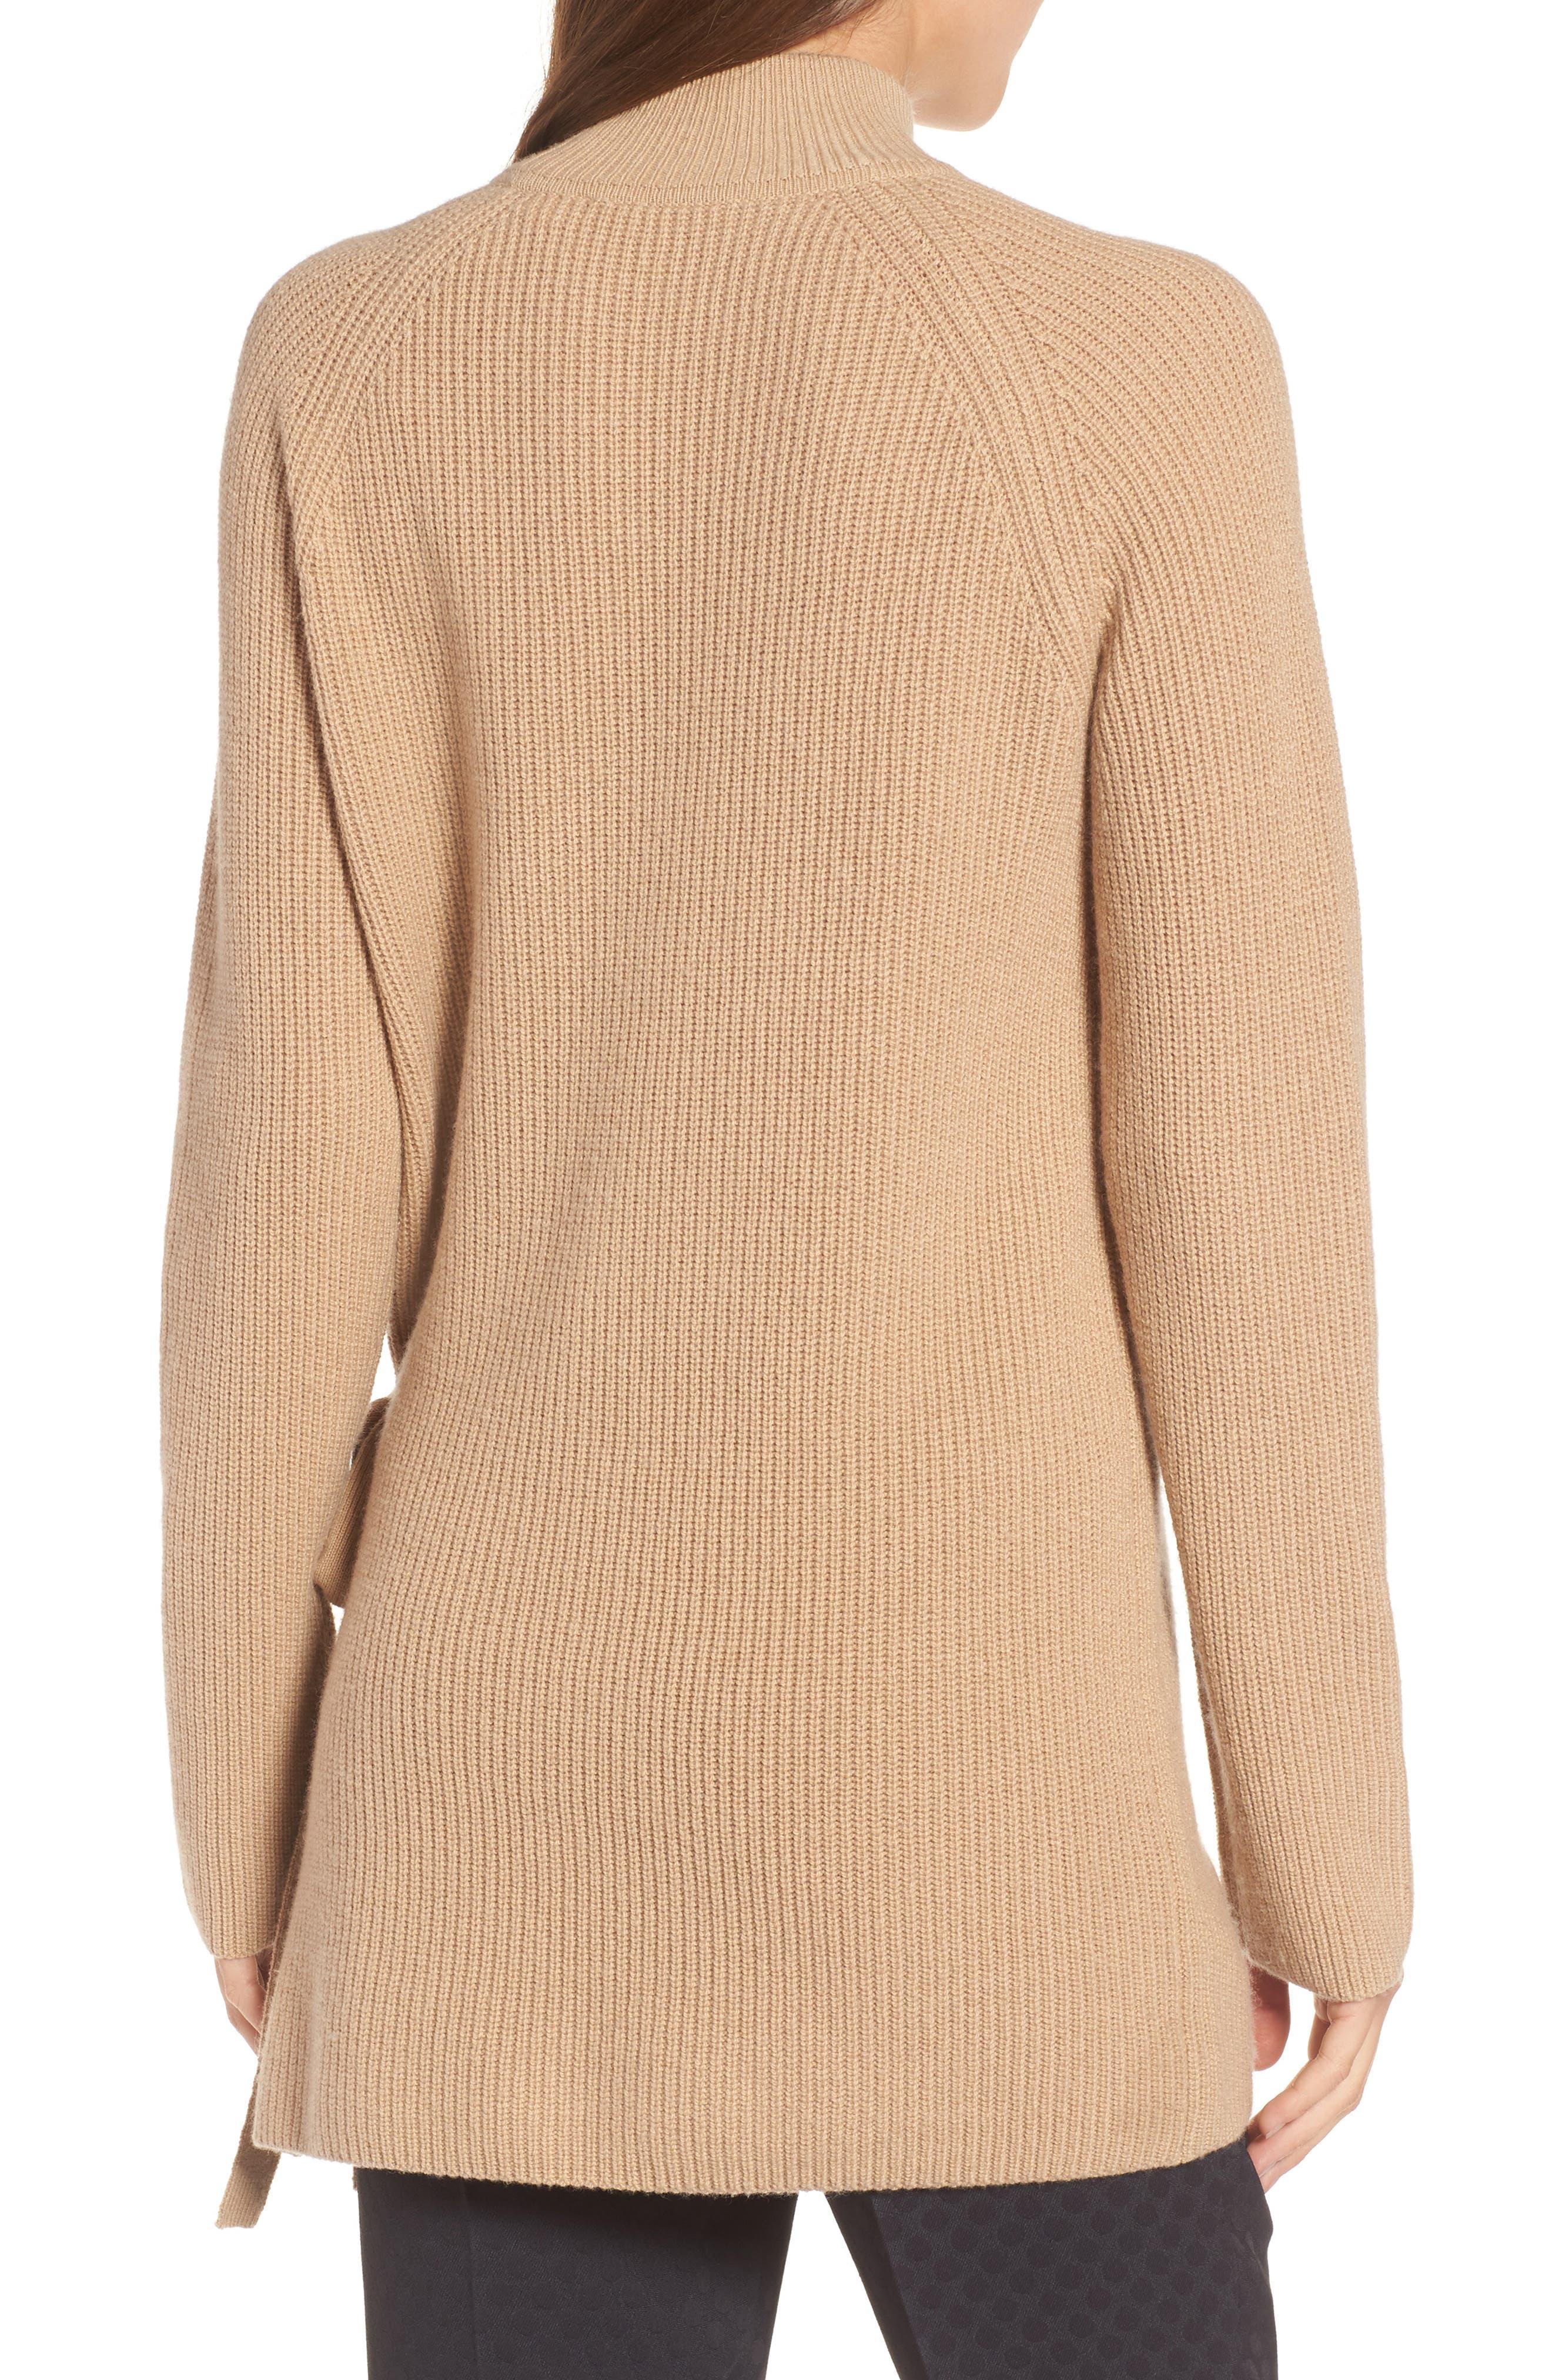 Filda Tie Side Sweater,                             Alternate thumbnail 2, color,